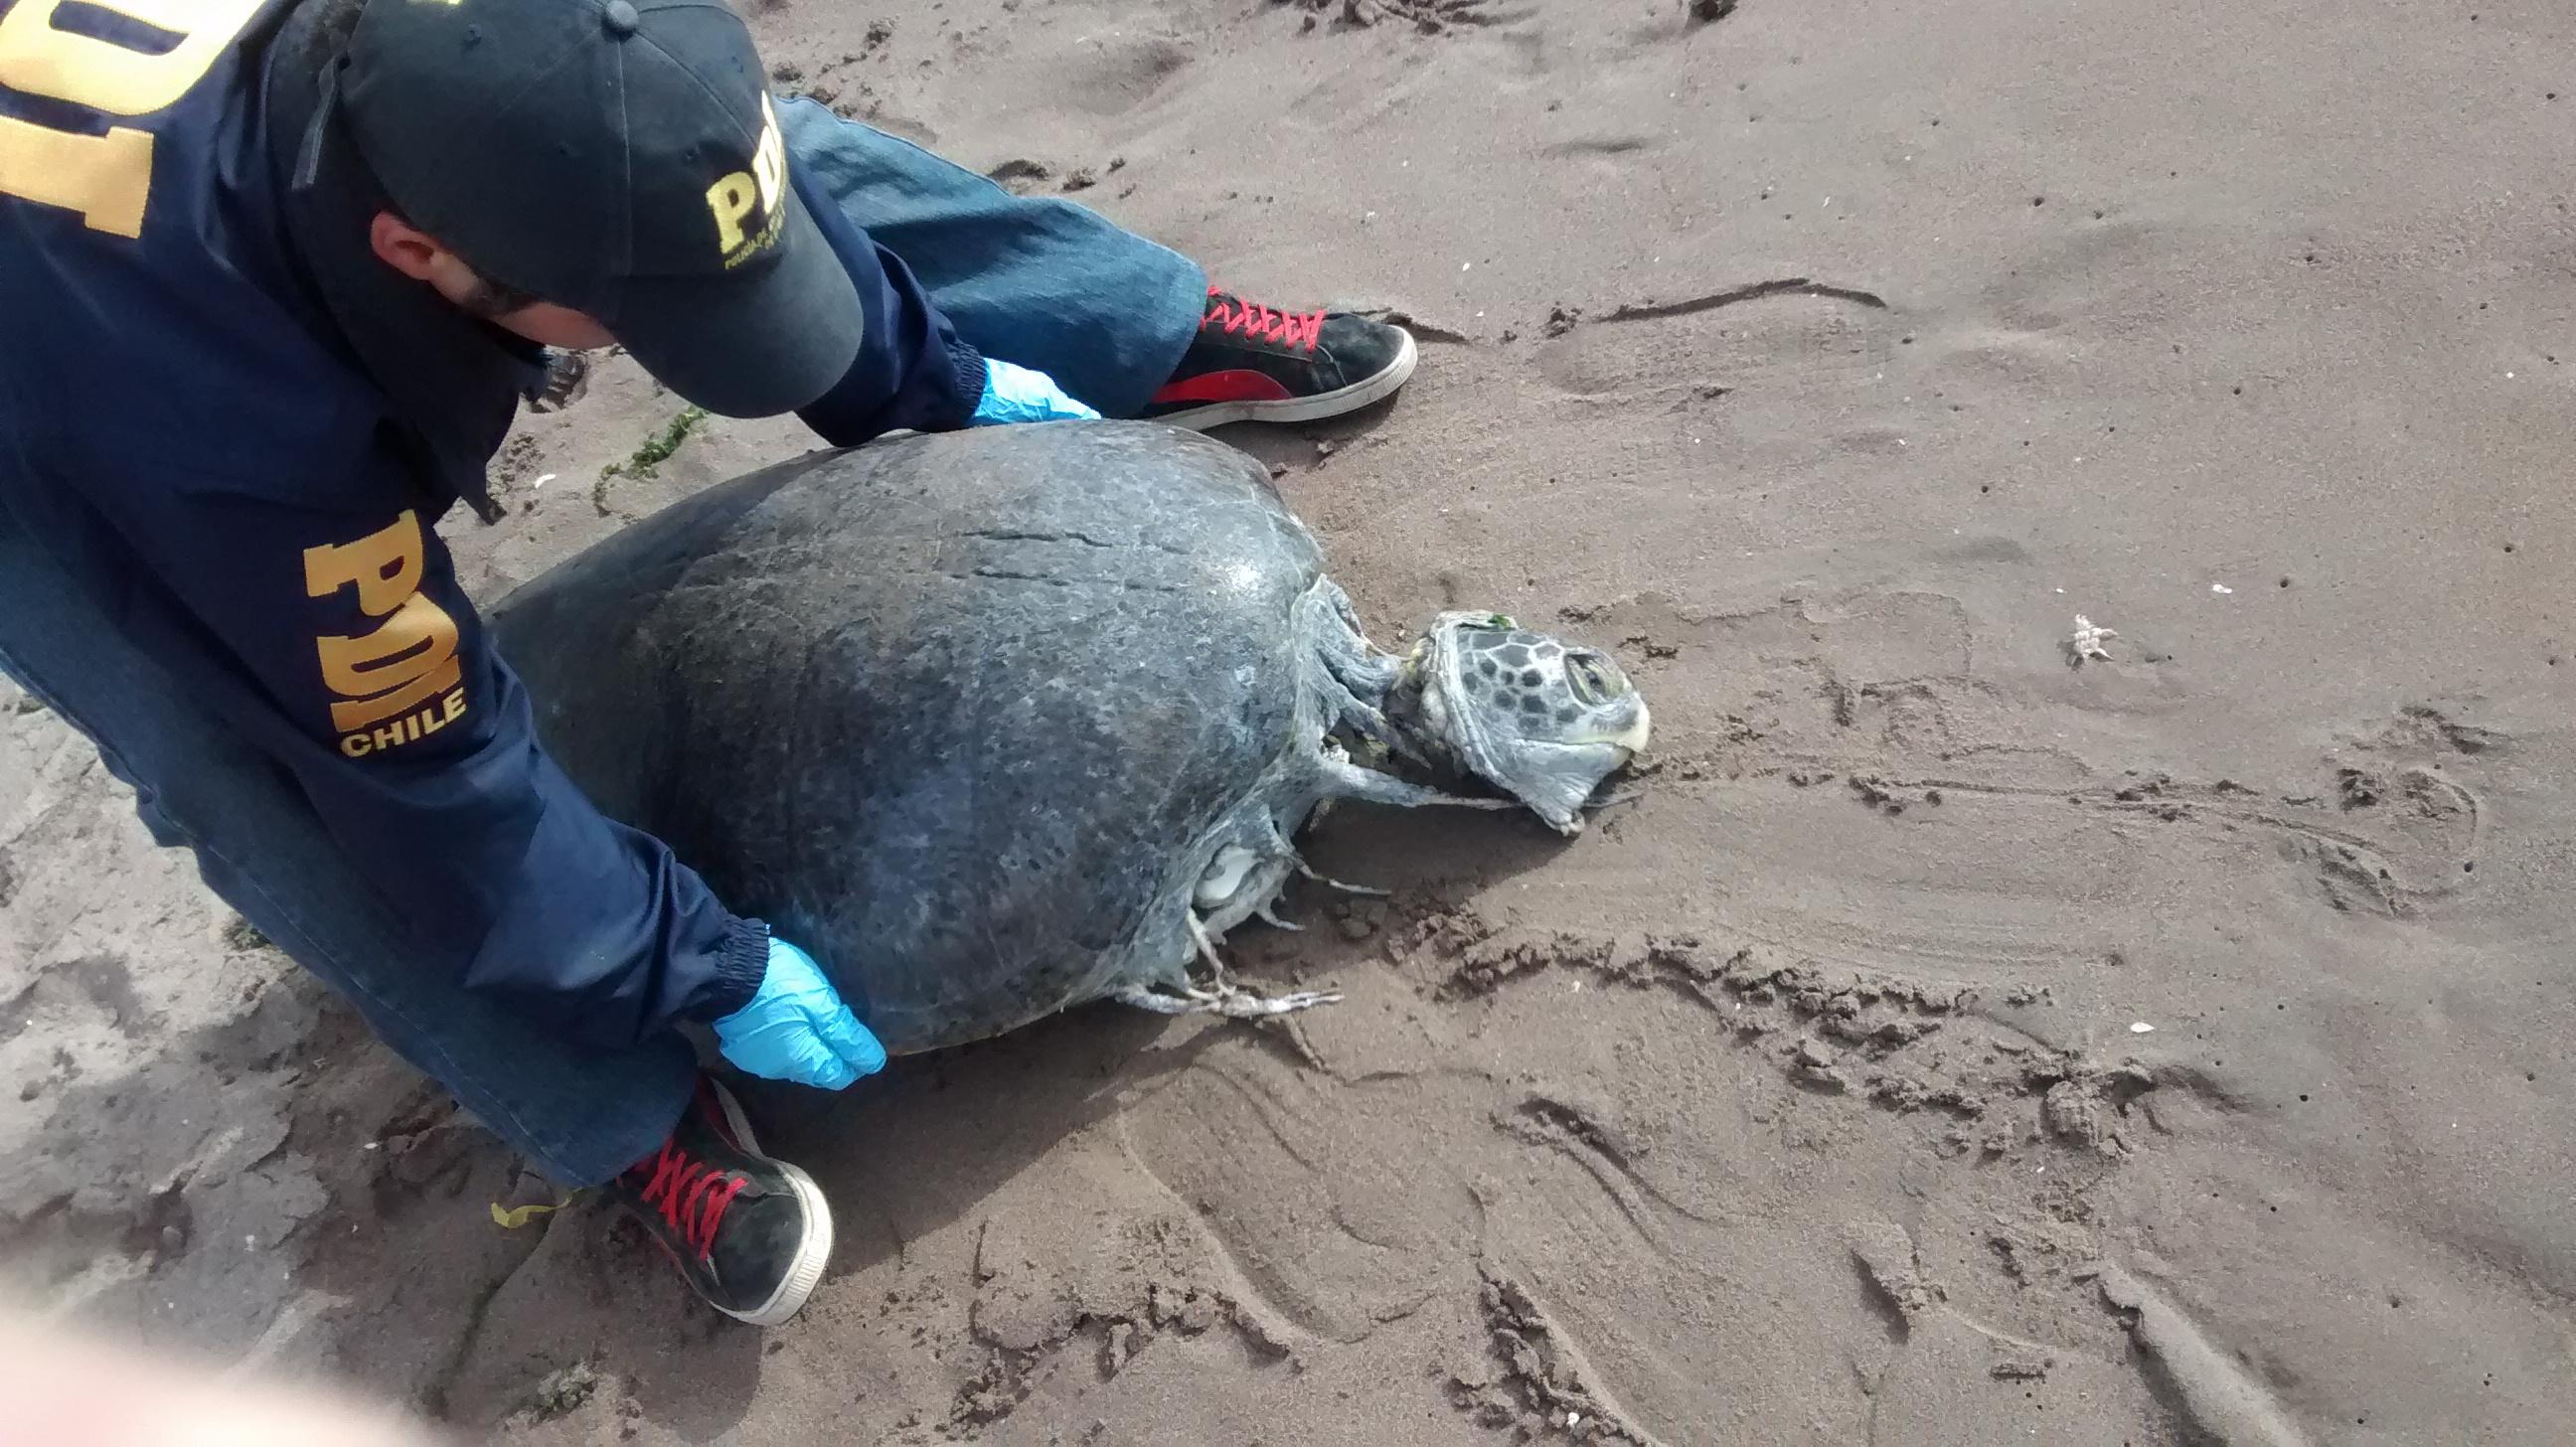 Hallan Tortuga Verde Descuartizada: PDI Investiga Hecho